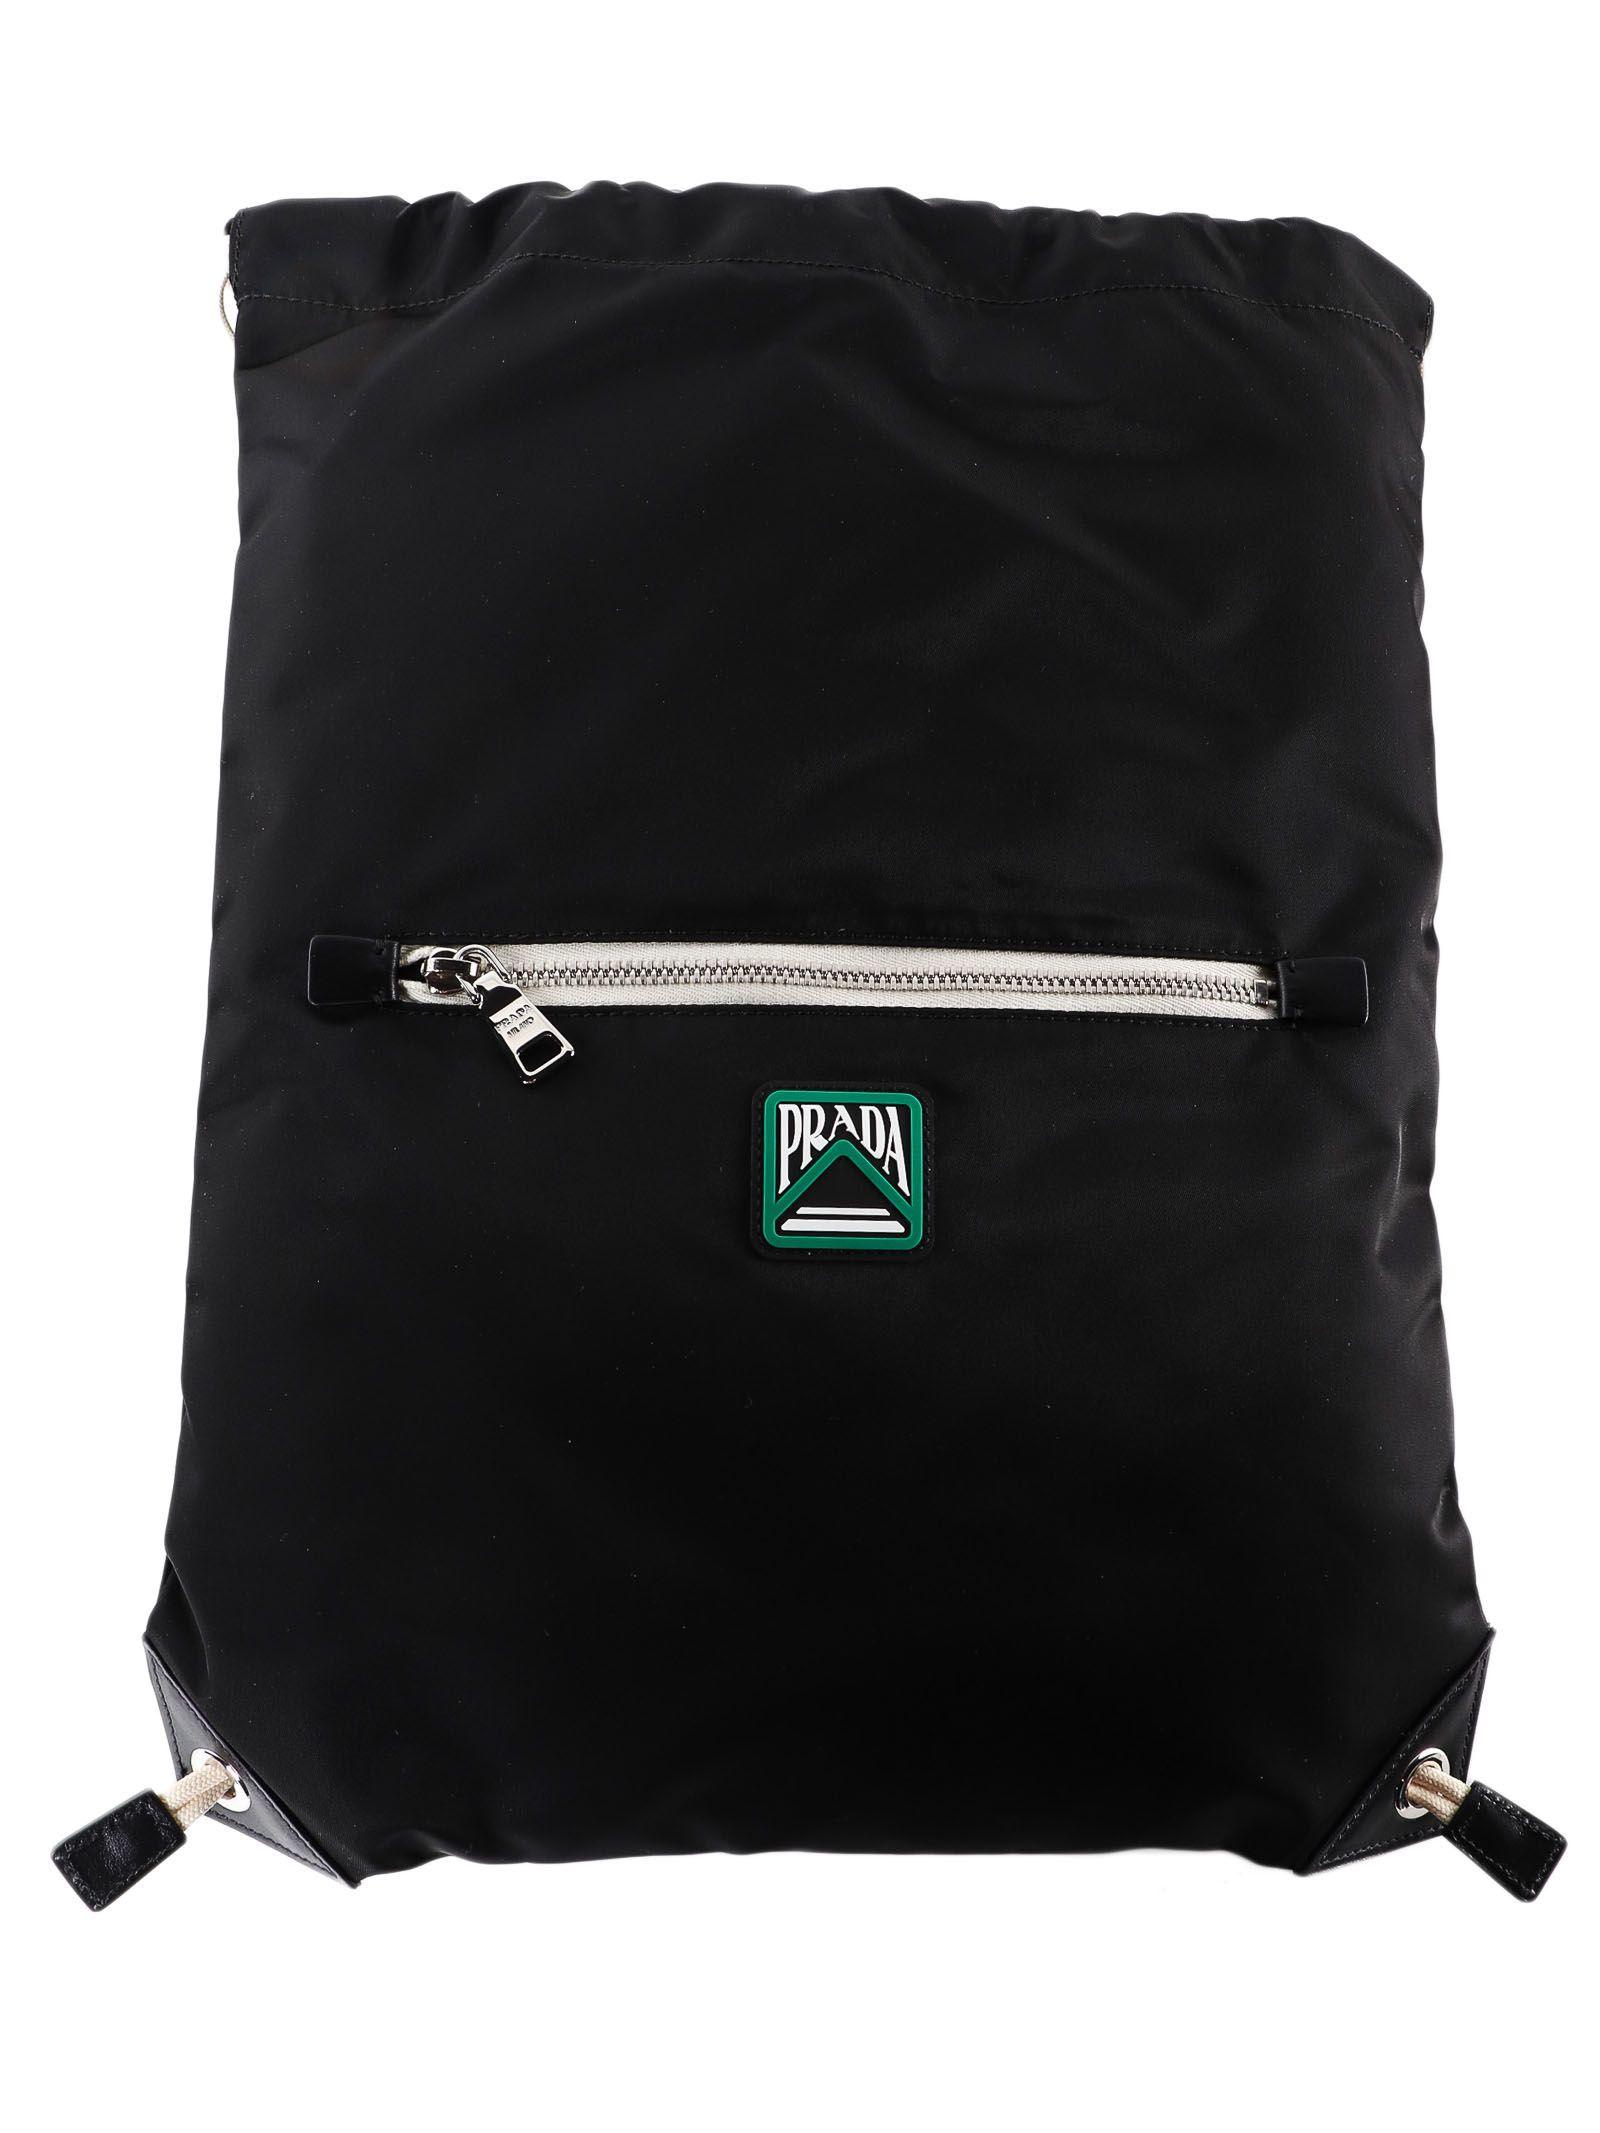 aabbf1f205f7 Prada Prada Drawstring Backpack - Nero - 10795373 | italist